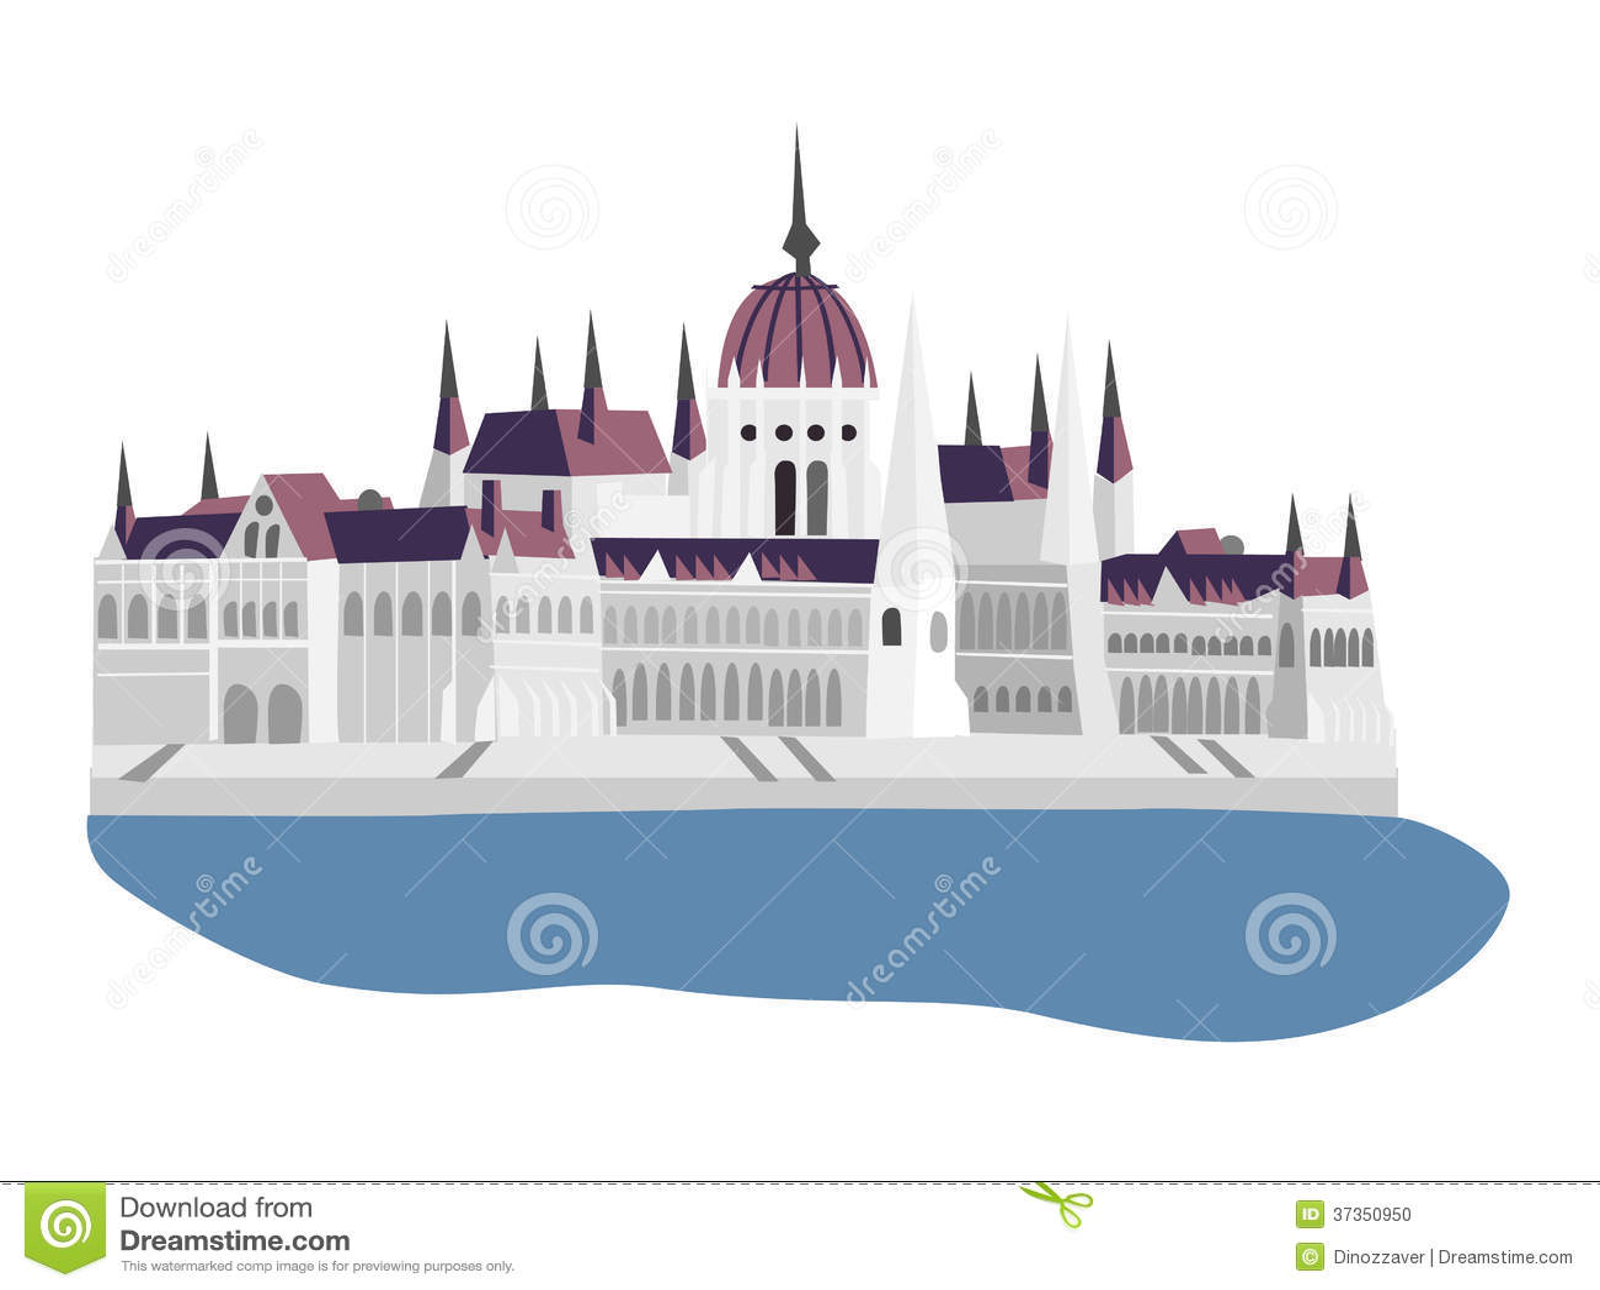 Budapest Parliament Illustration Stock Photo Image 37350950